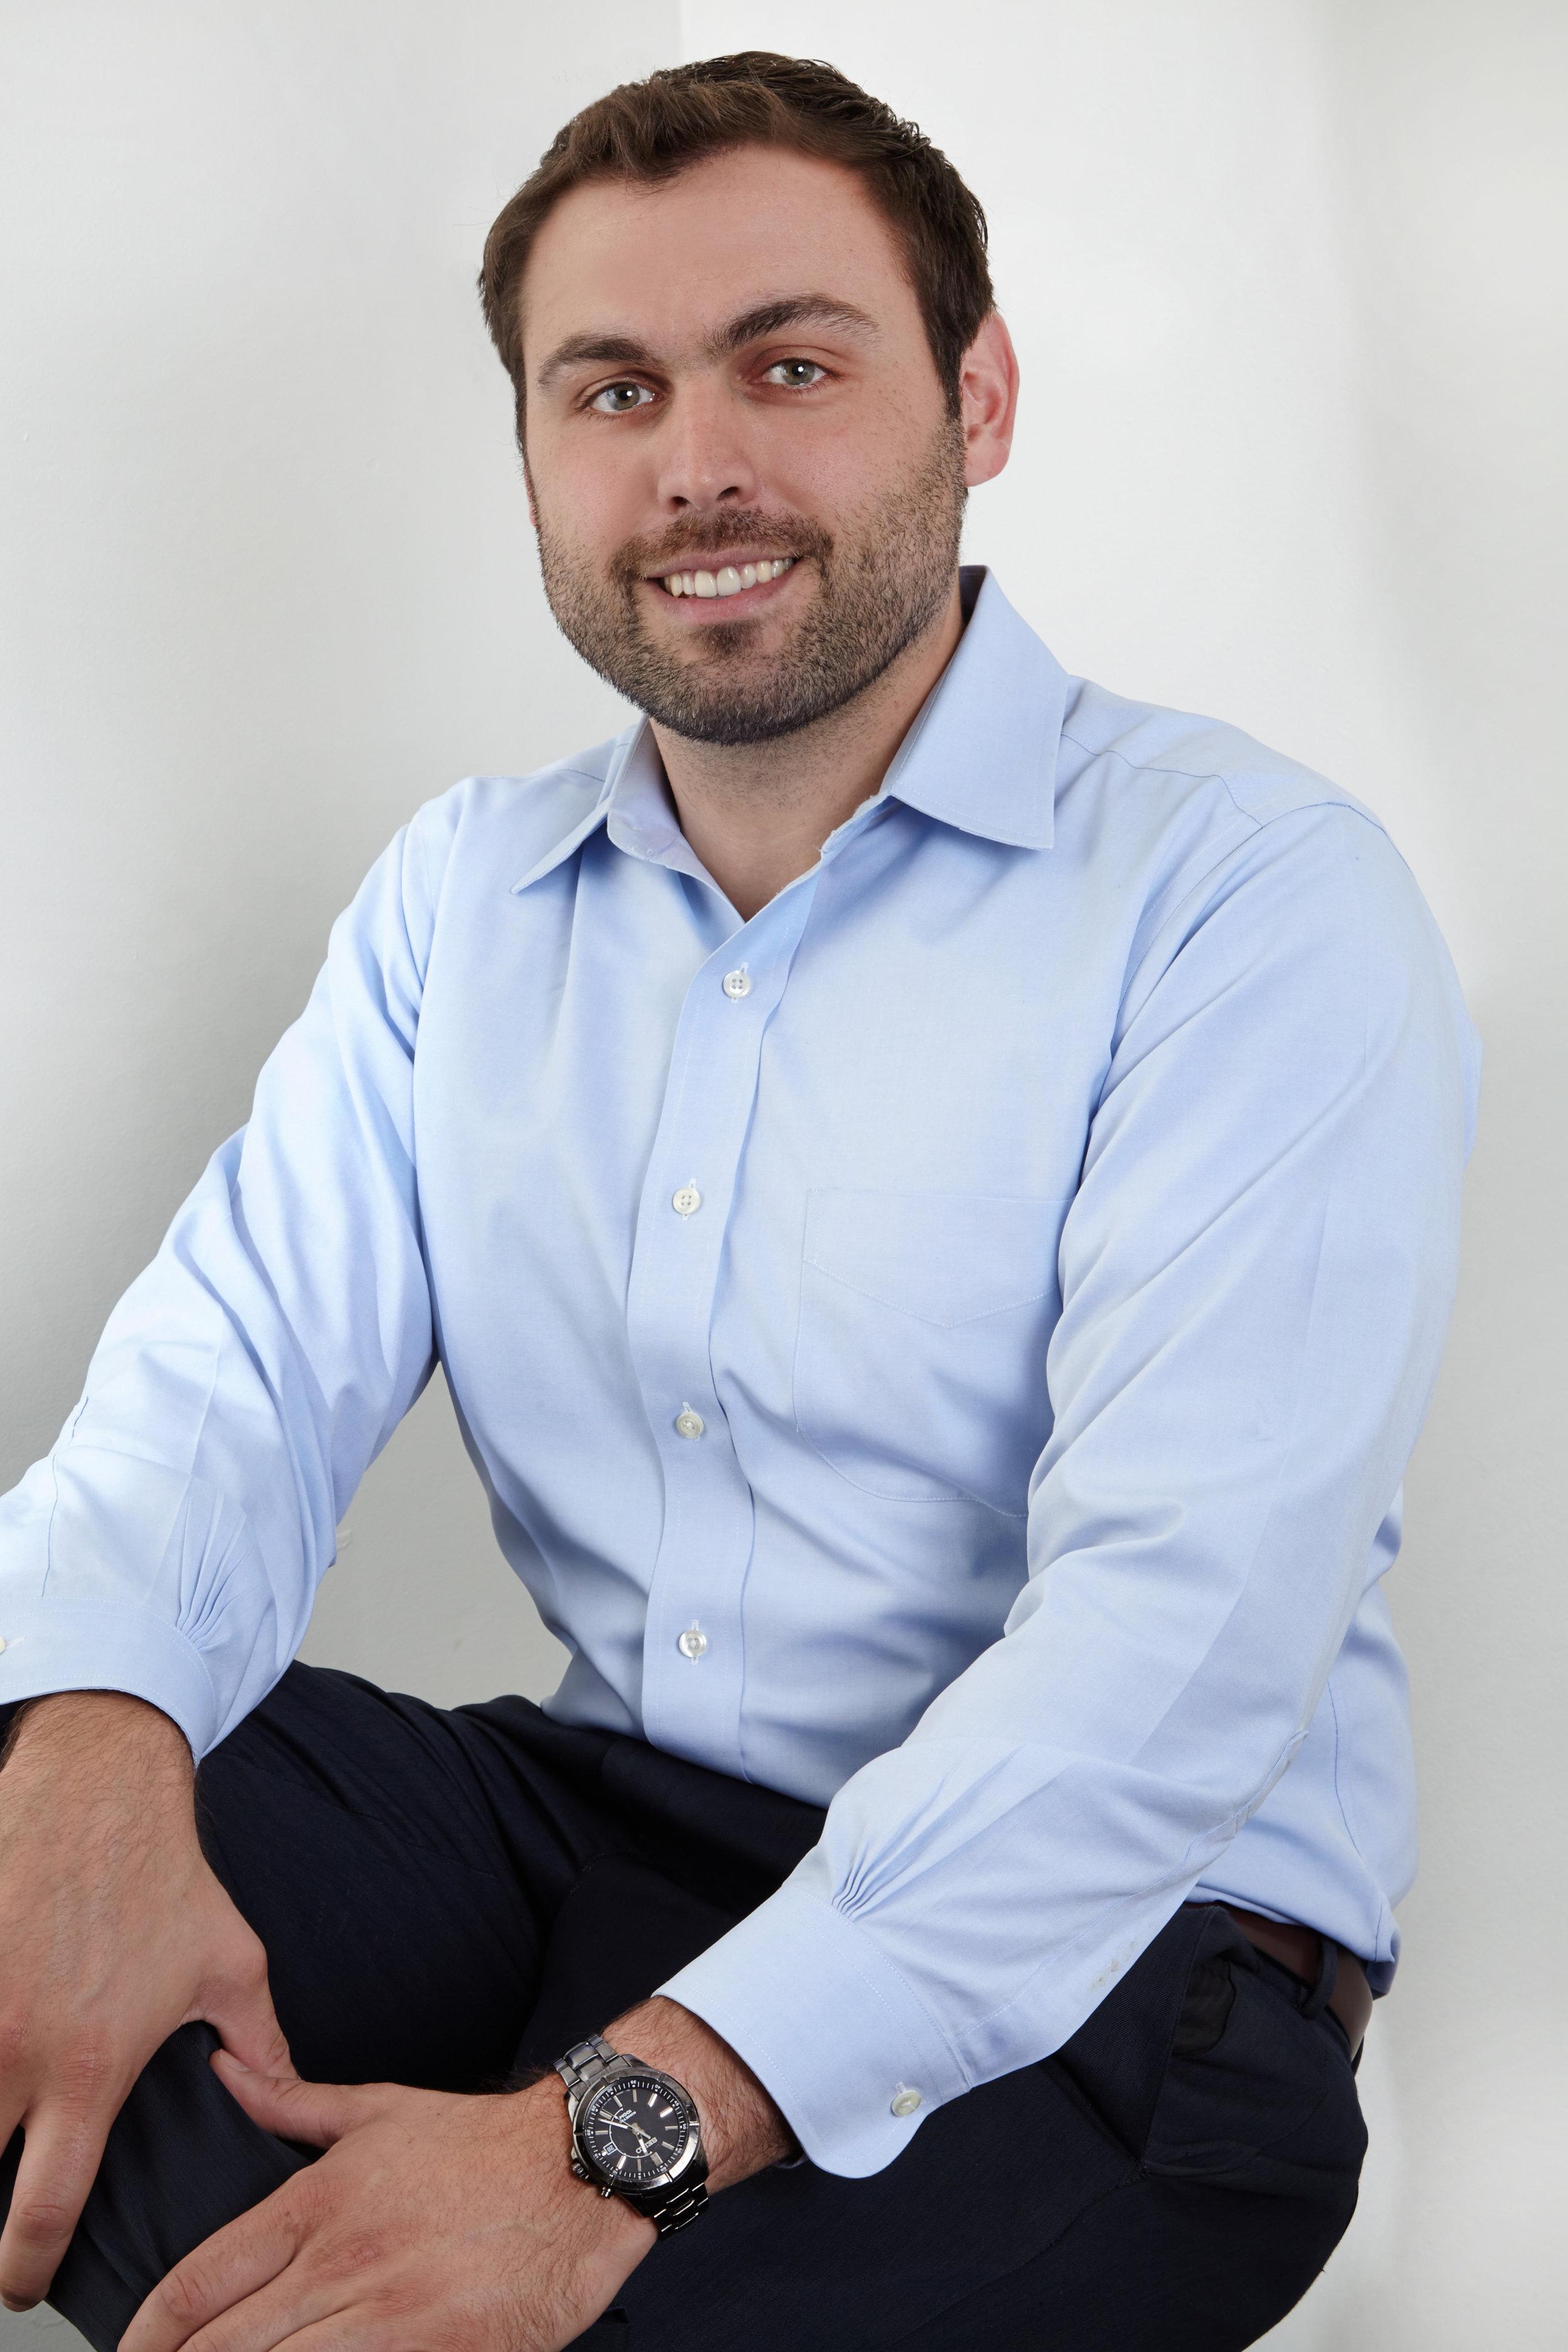 Dr. Anthony Perrone